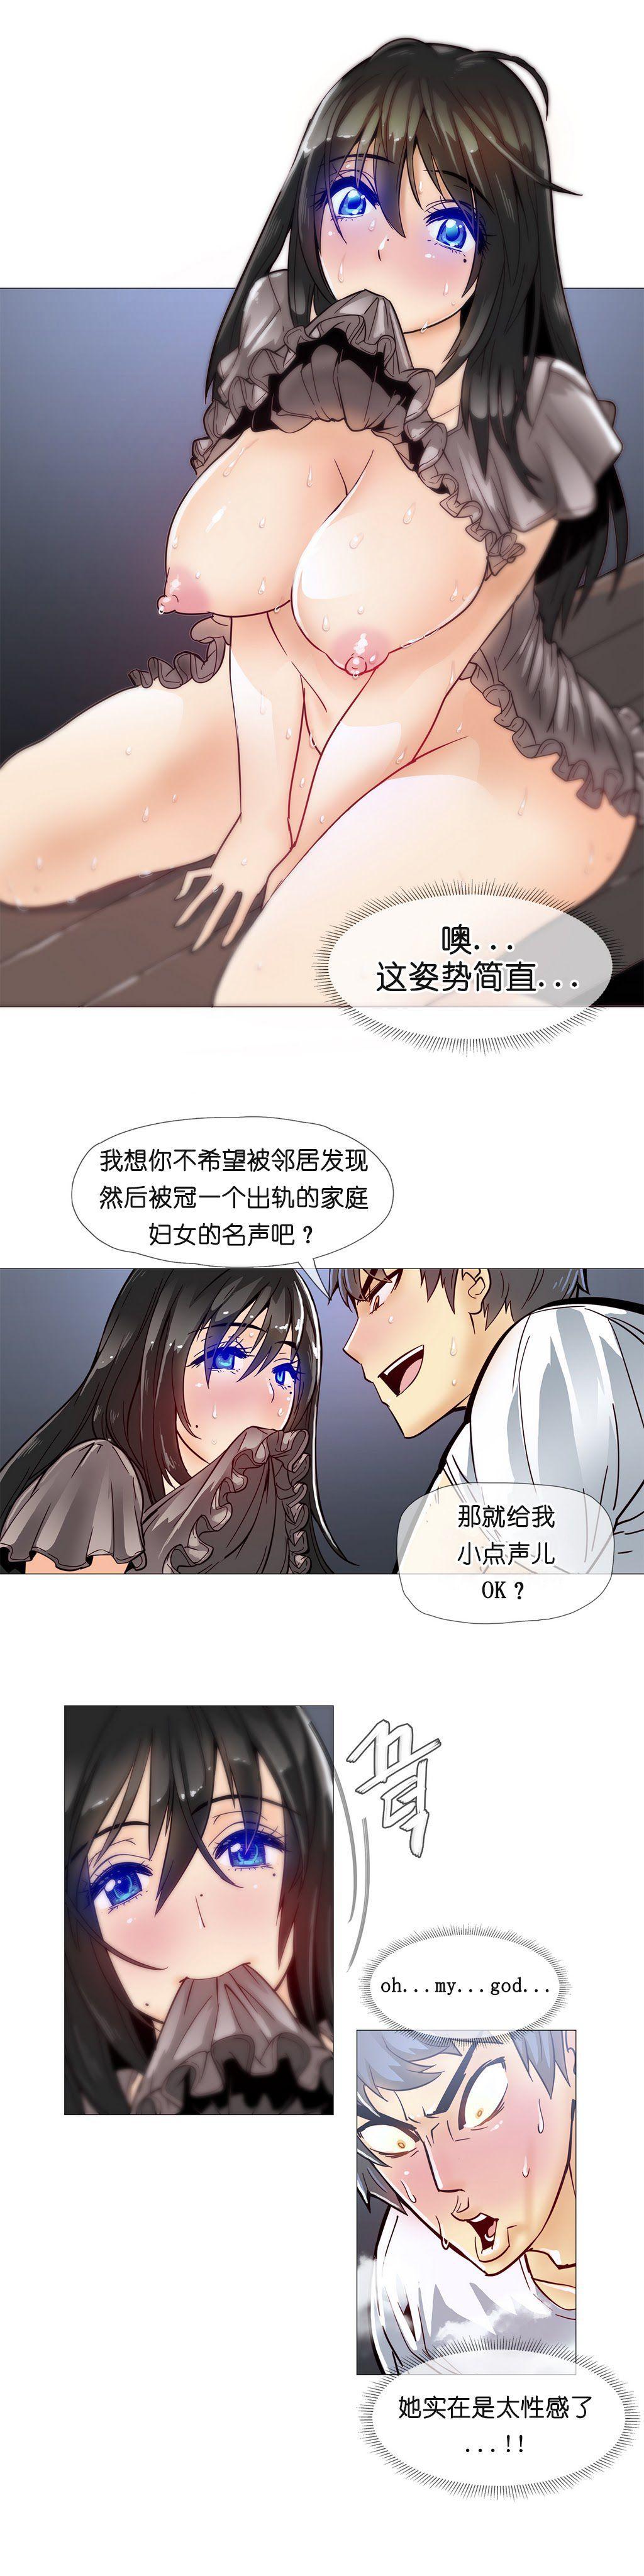 HouseHold Affairs 【卞赤鲤个人汉化】1~33话(持续更新中) 185